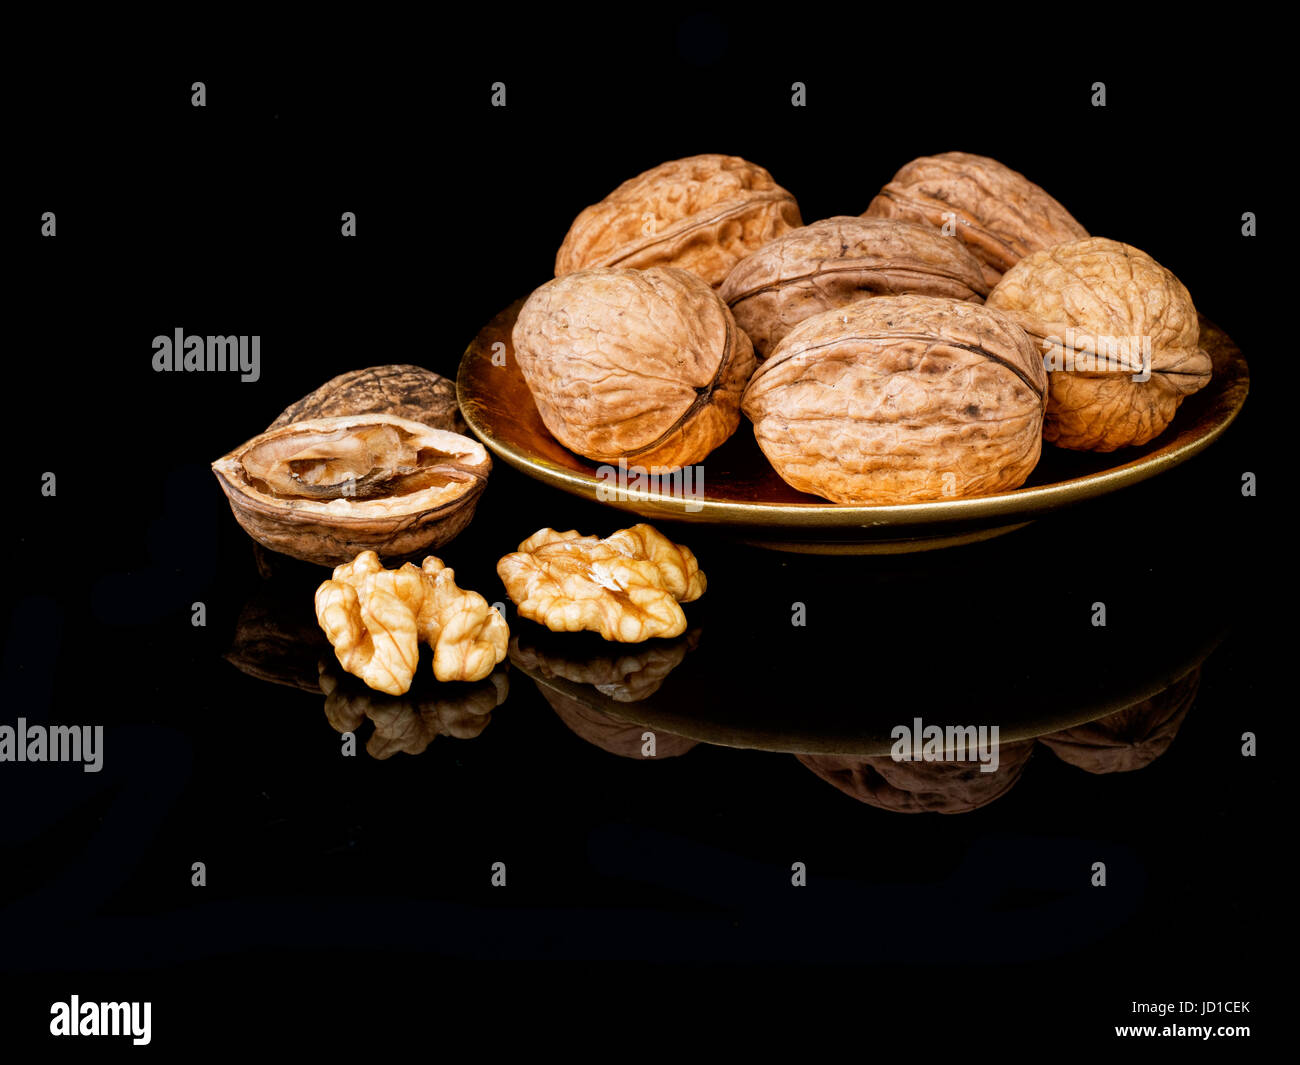 Walnuts on plate. Healthy snack. Contain melatonin to aid good sleep plus antioxidants and Omega-3 fatty acids to - Stock Image